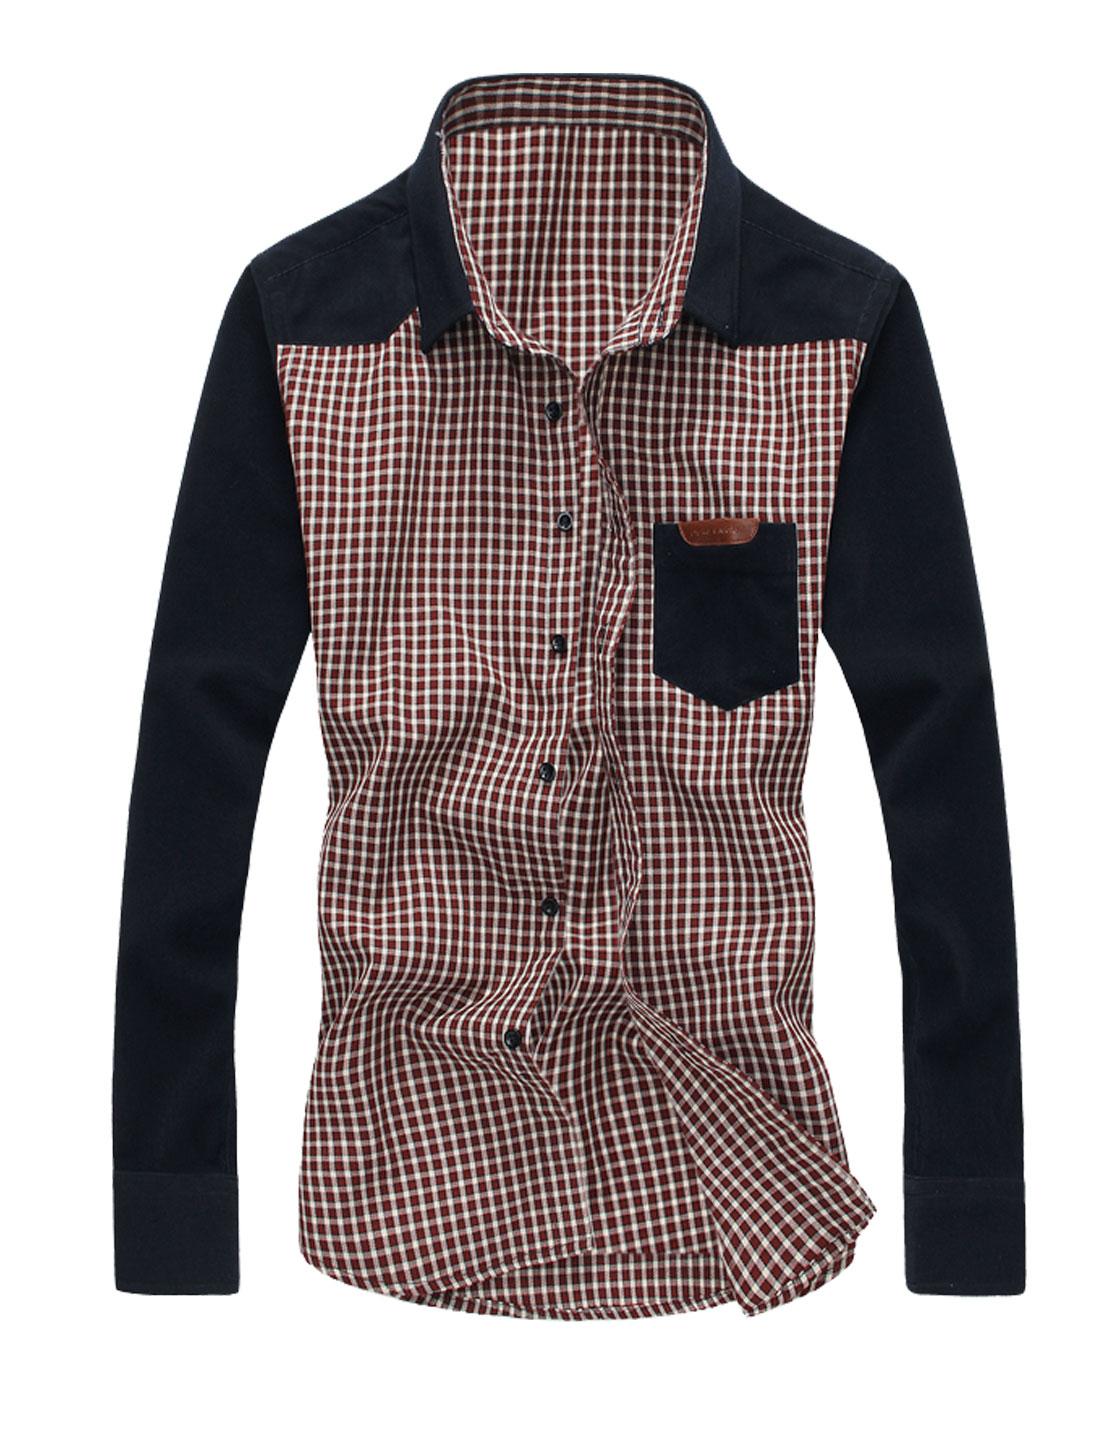 Men Long Sleeve Point Collar Pocket Plaids Shirts Tops Burgundy Navy Blue M